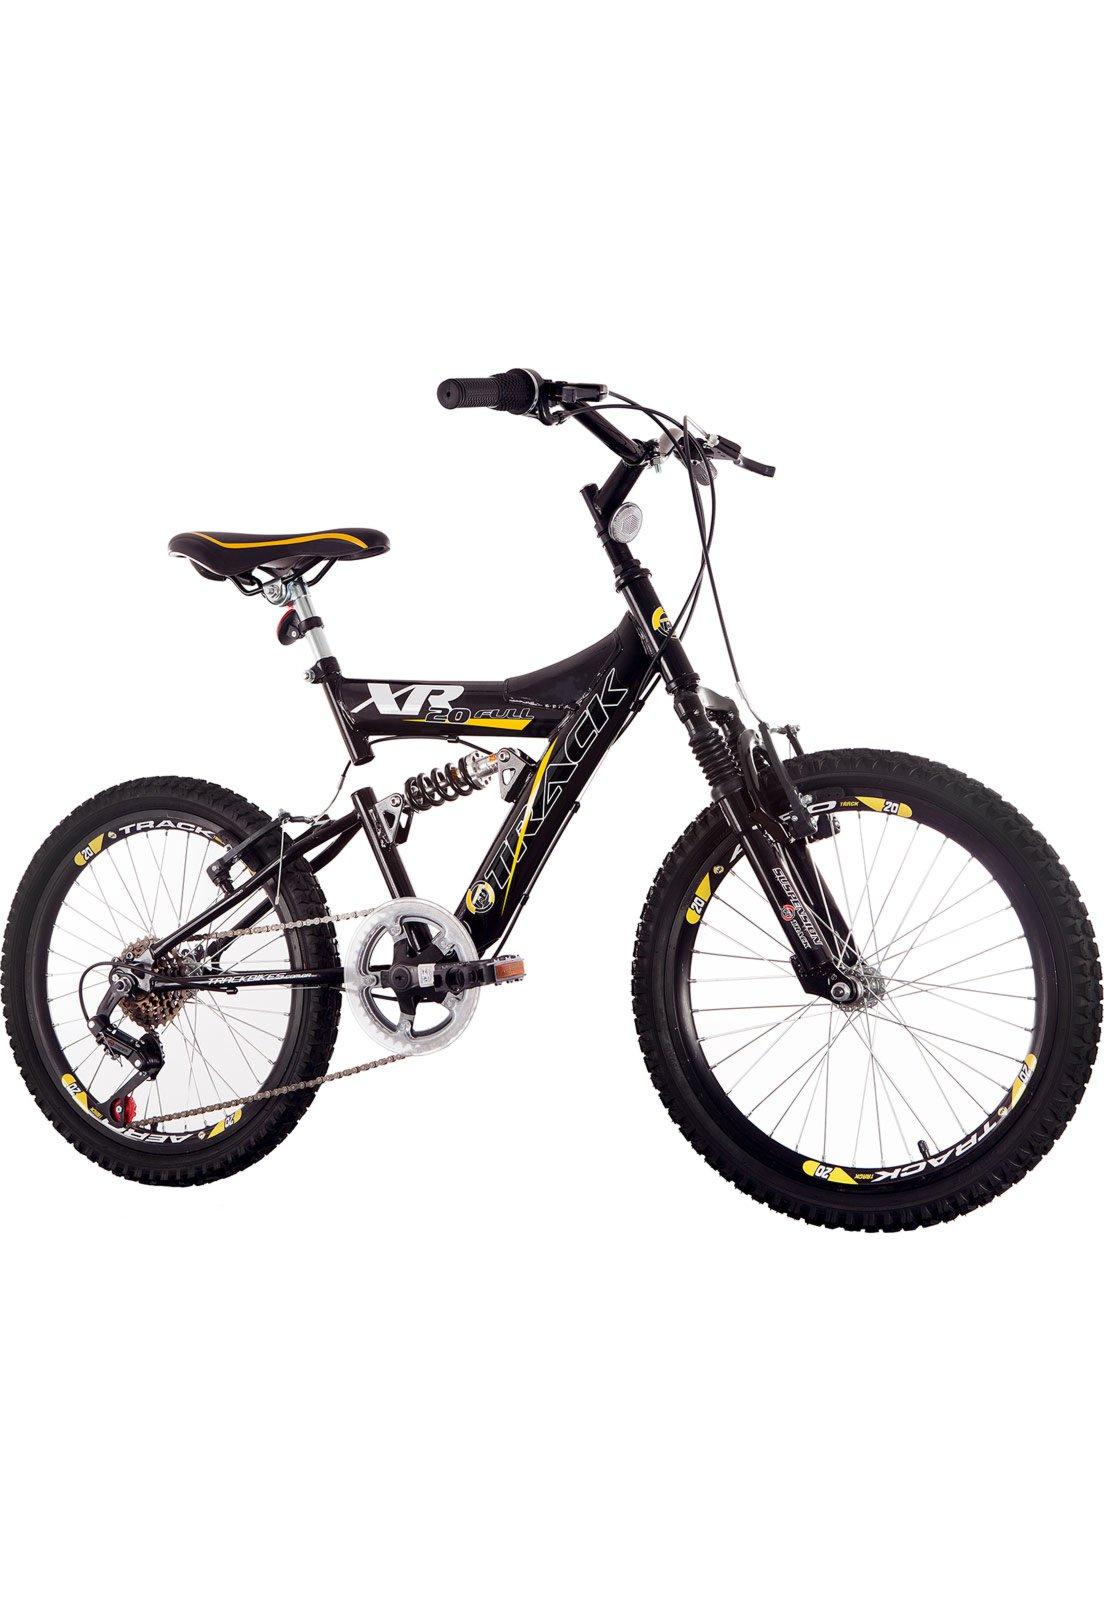 Bicicleta Track&bikes Xr20 Aro 20 Full Suspensão 6 Marchas - Preto